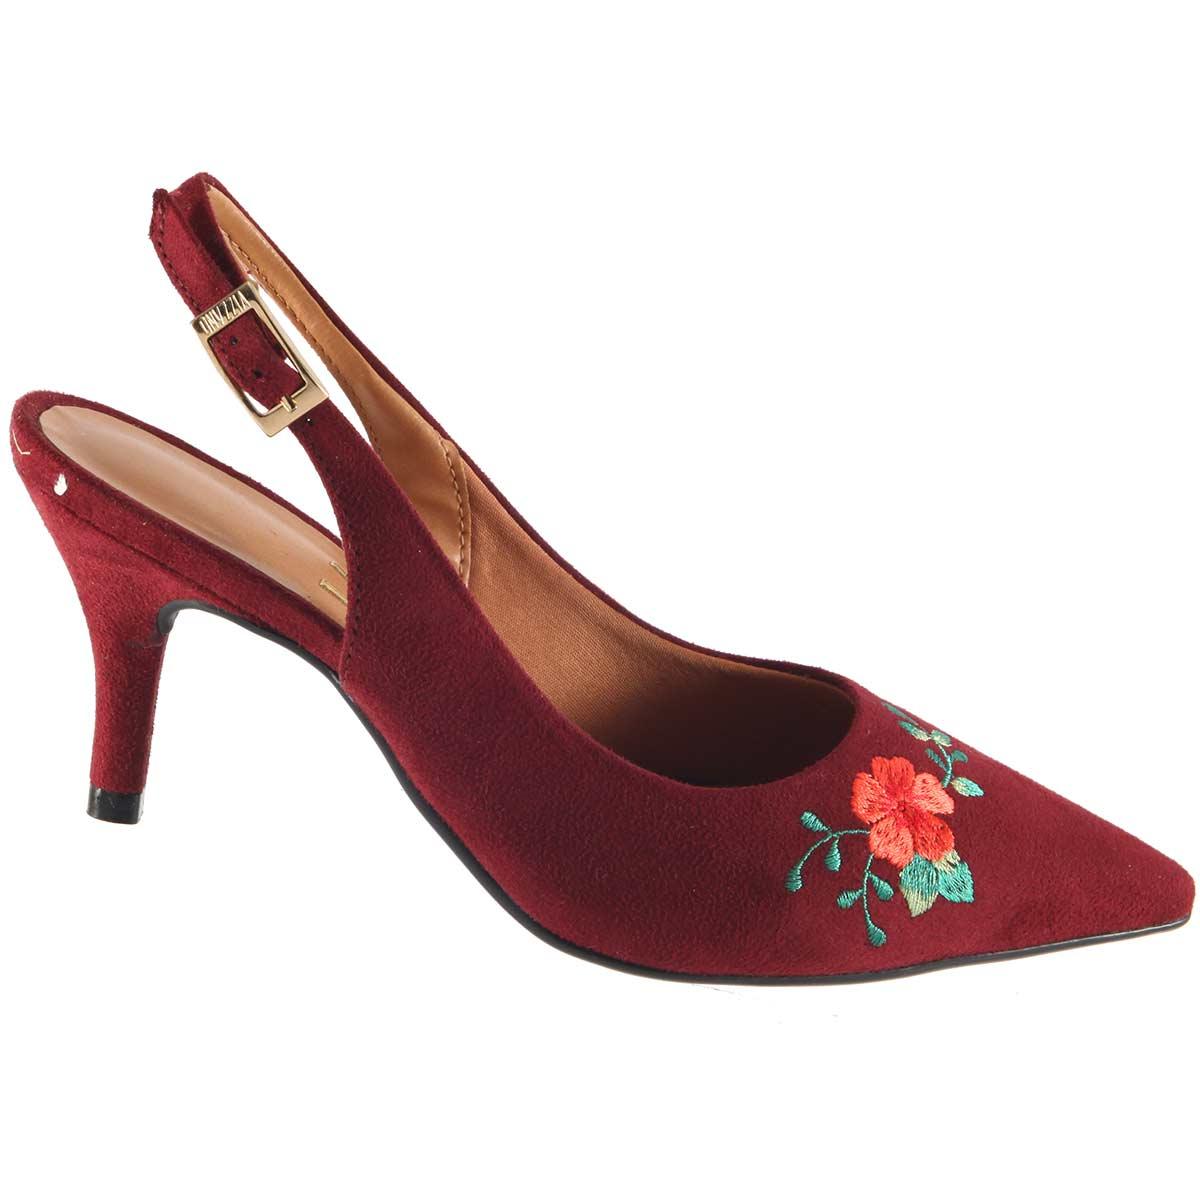 Sapato Vizzano Scarpin Chanel Feminino Bordado 1185146